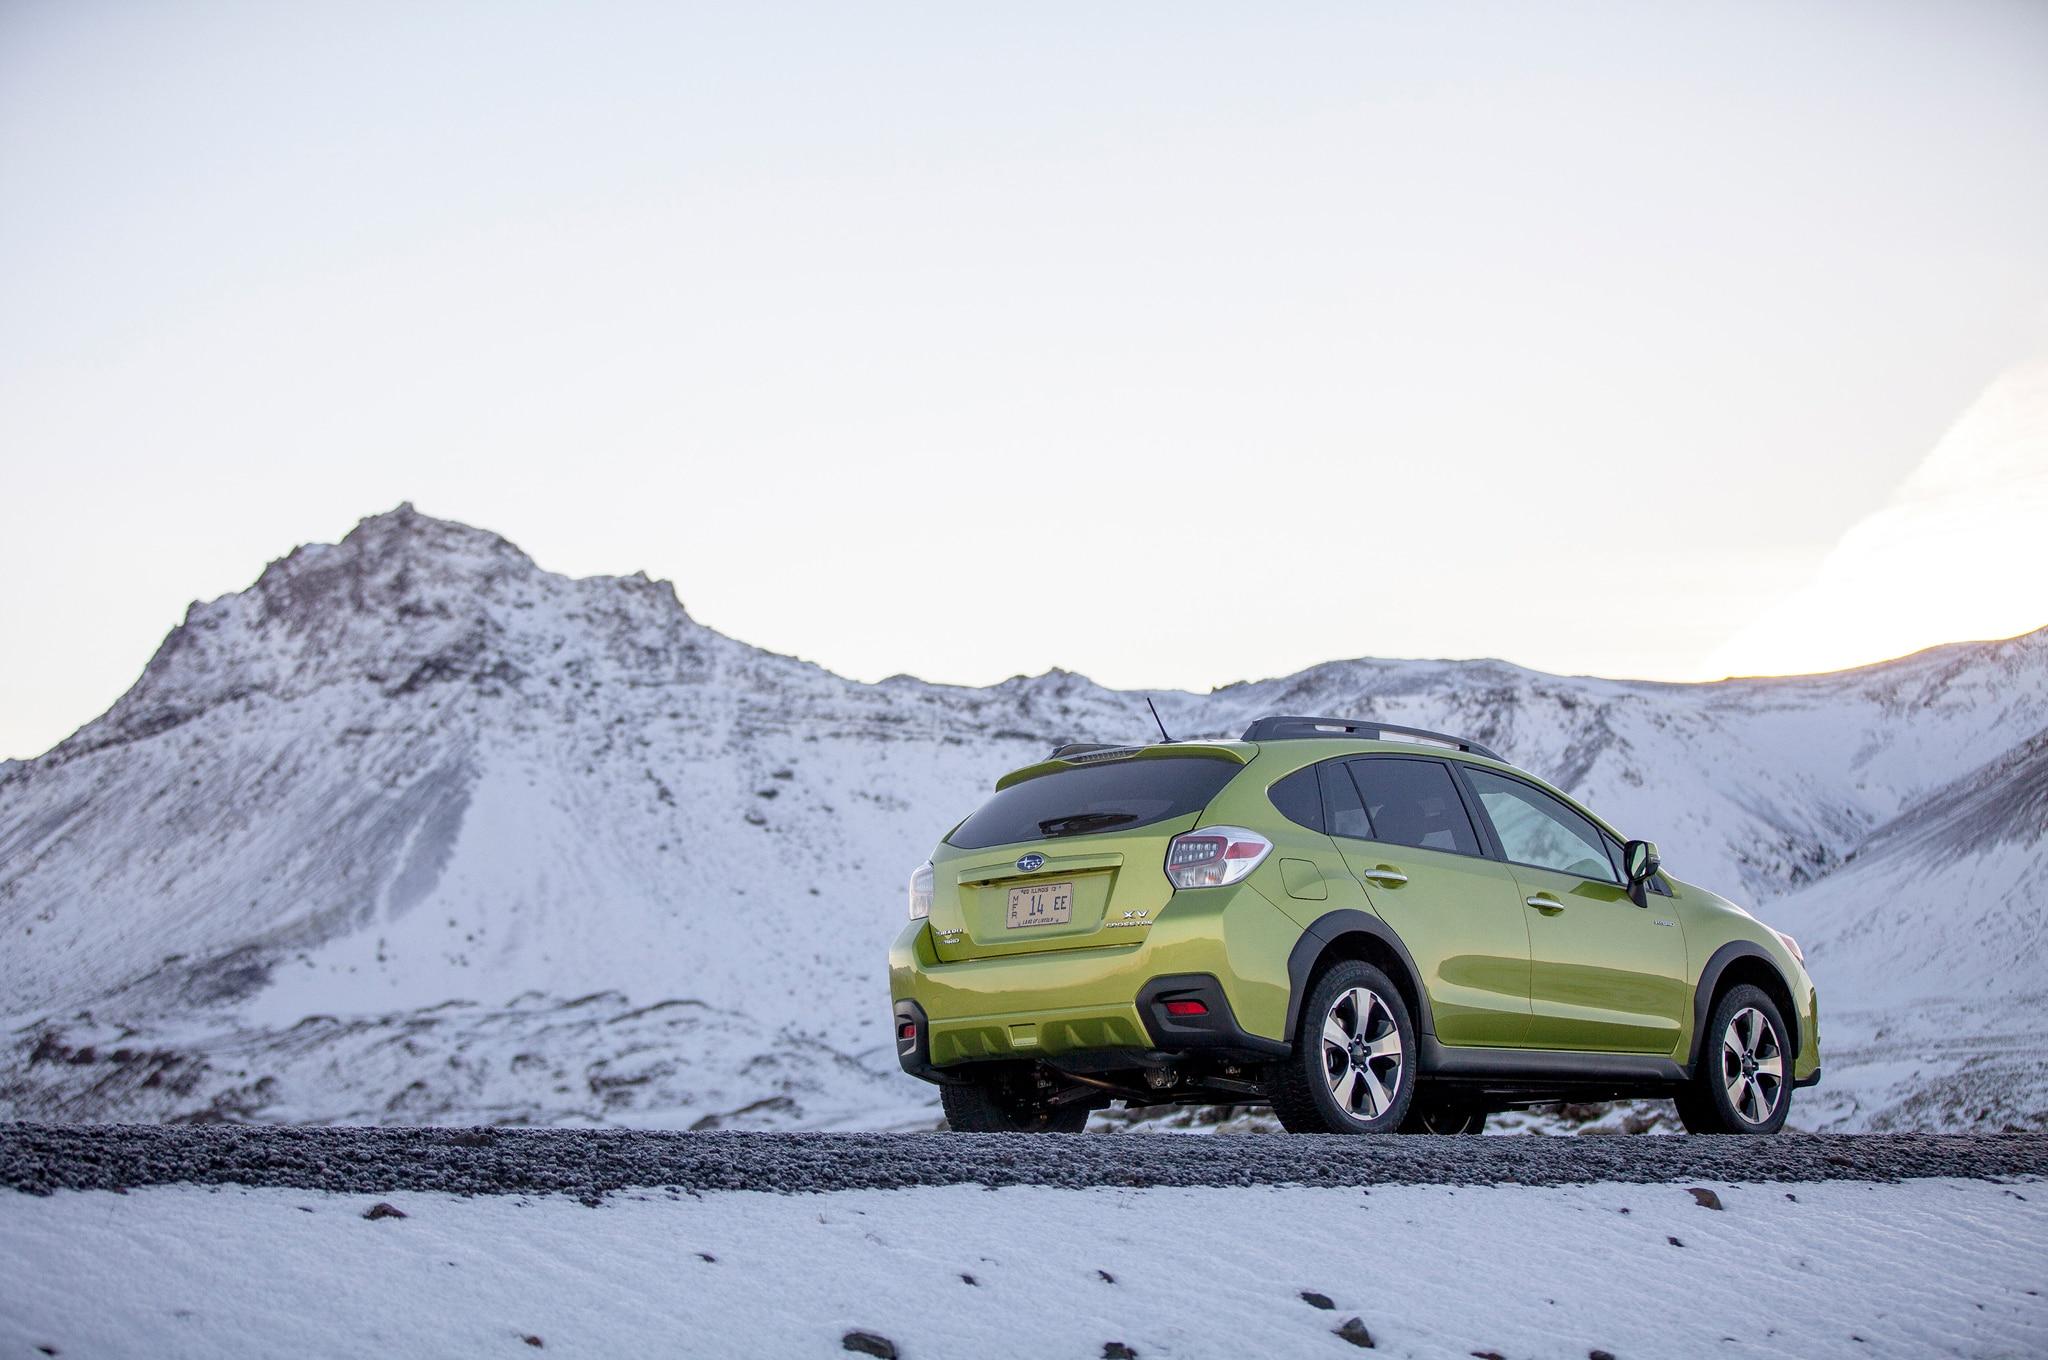 2014 Subaru XV Crosstrek Hybrid Green Rear Three Quarters Static